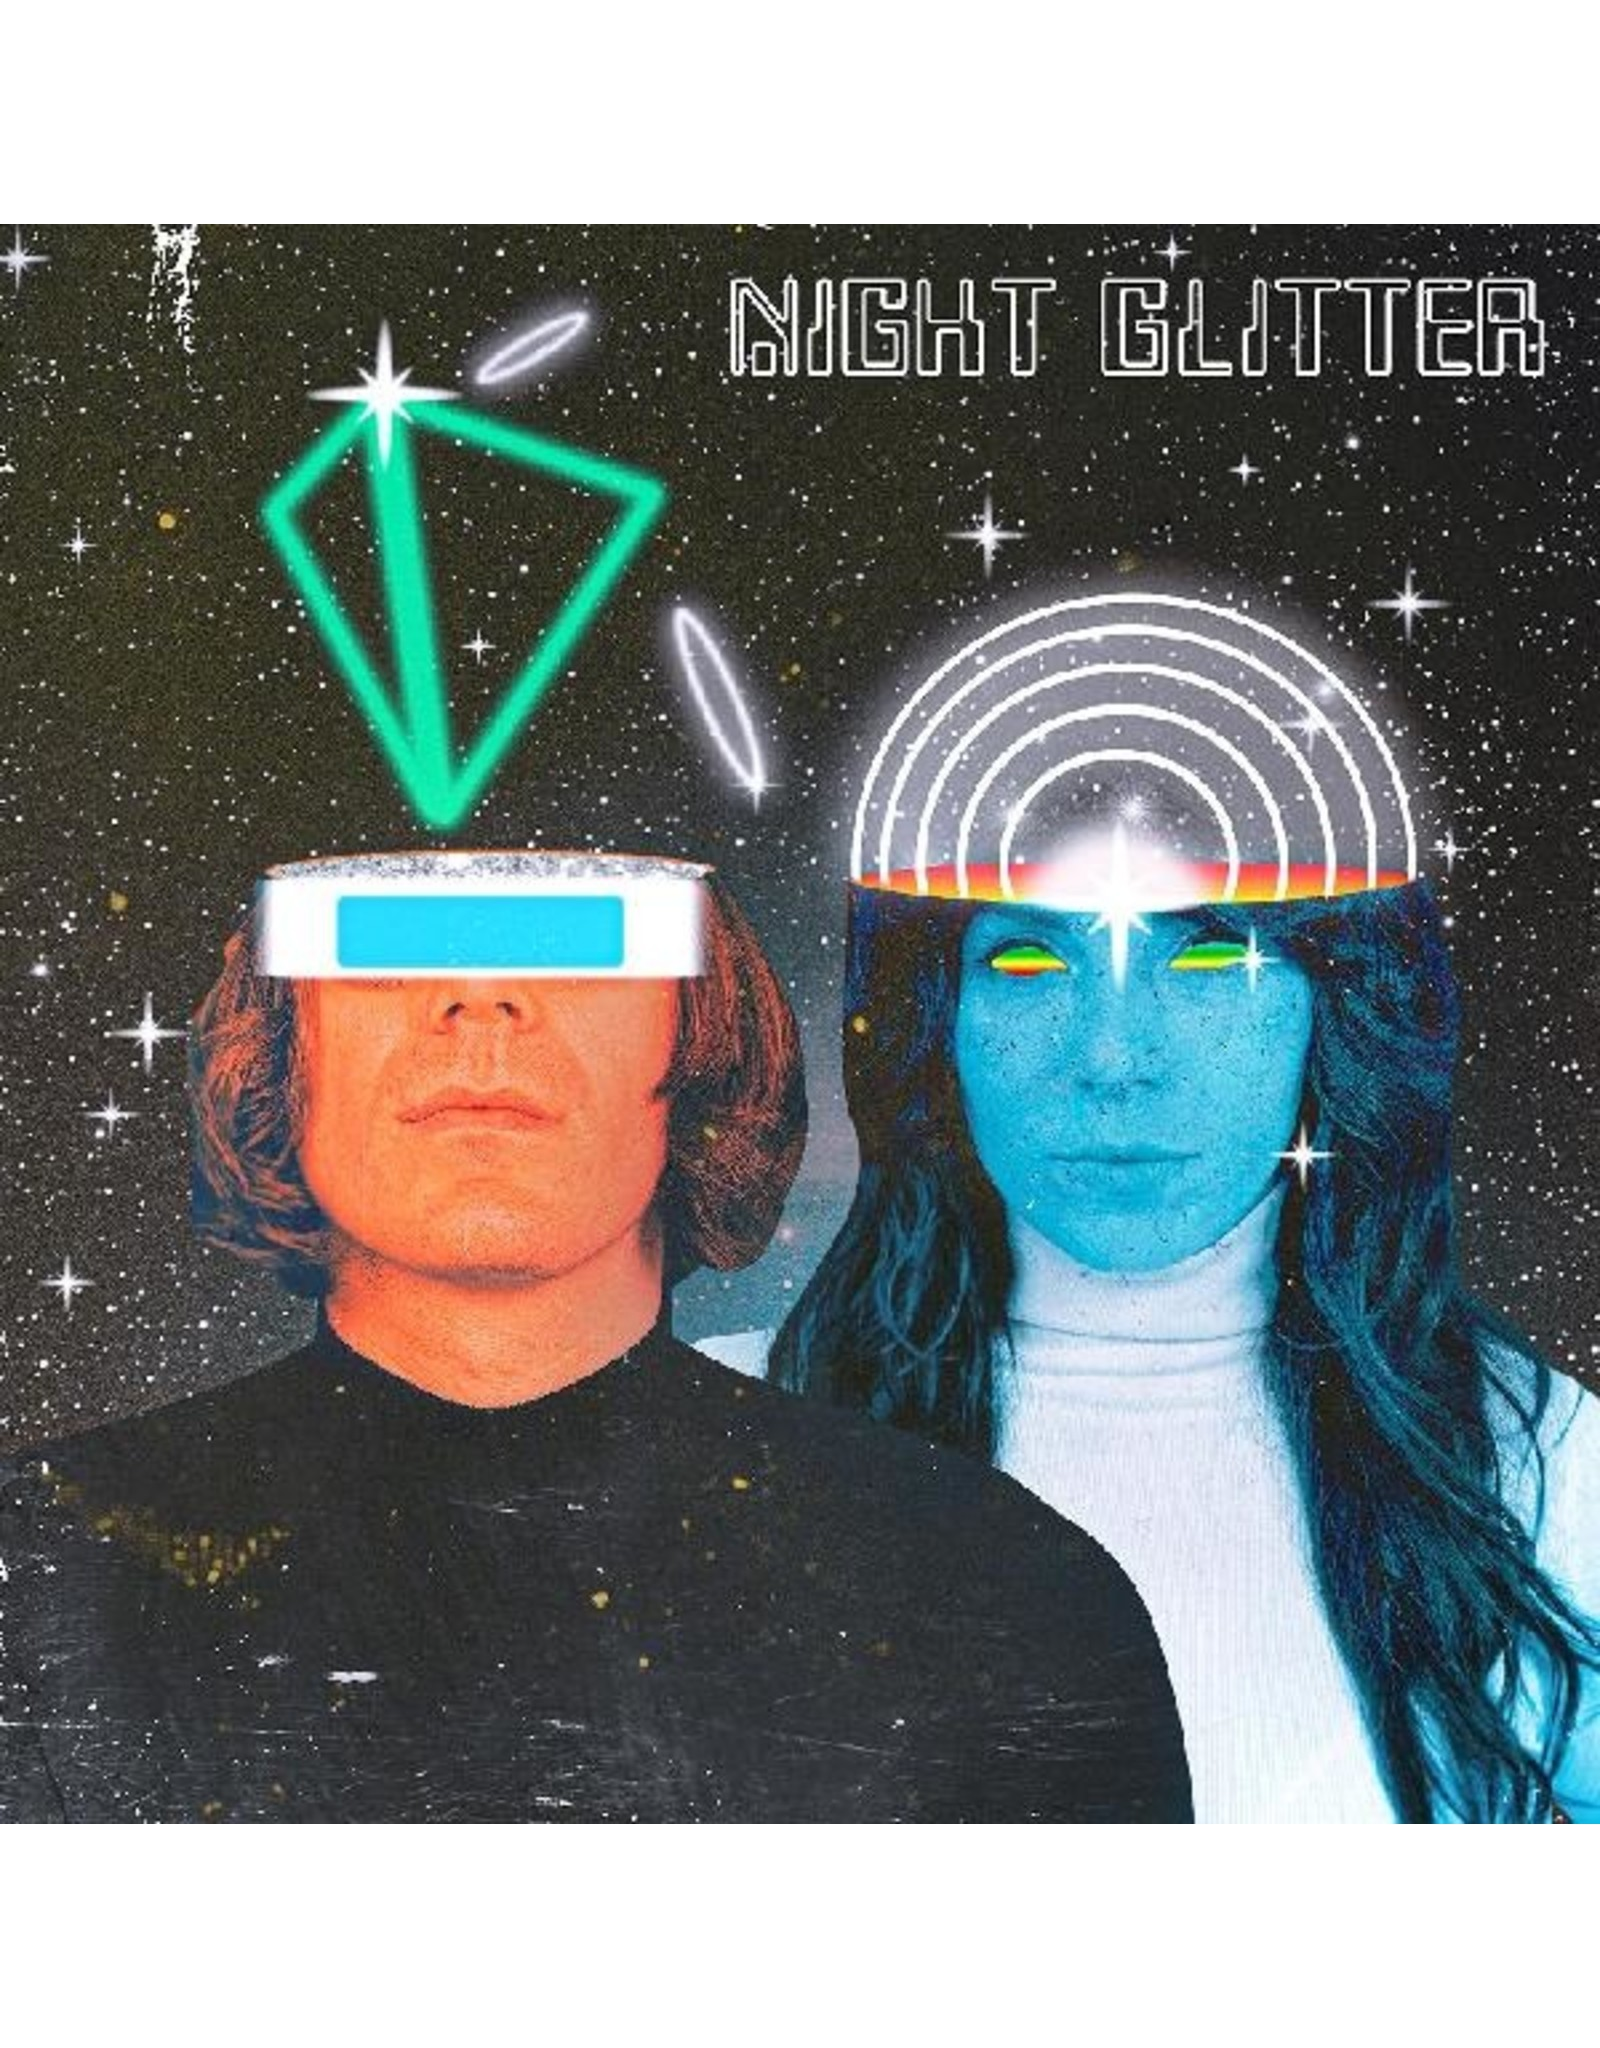 New Vinyl Night Glitter - S/T LP